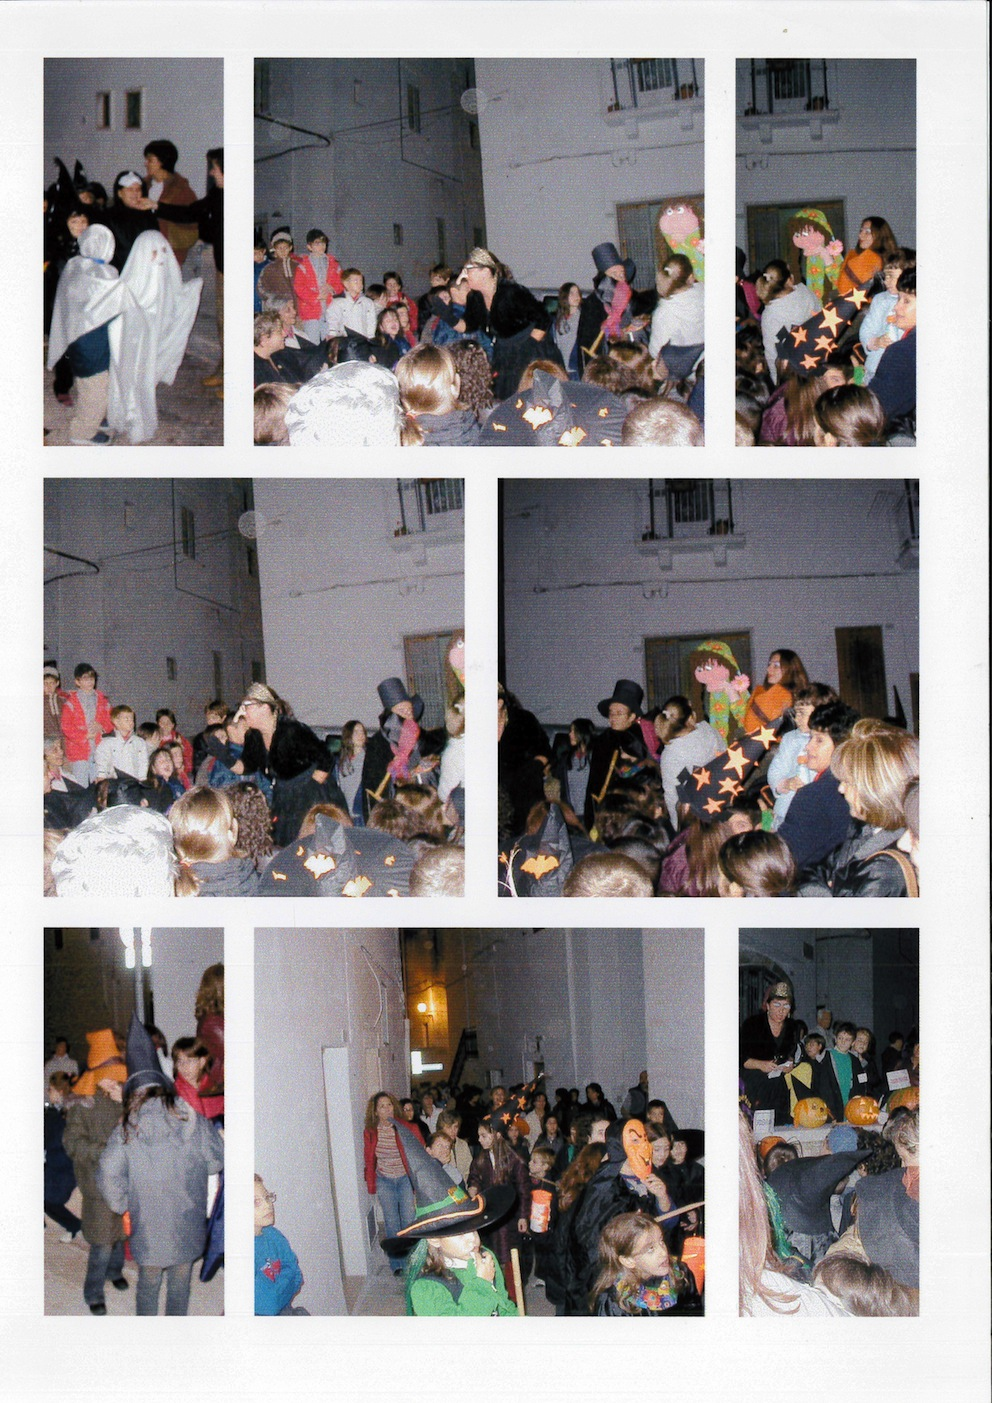 20031031_Halloween_02